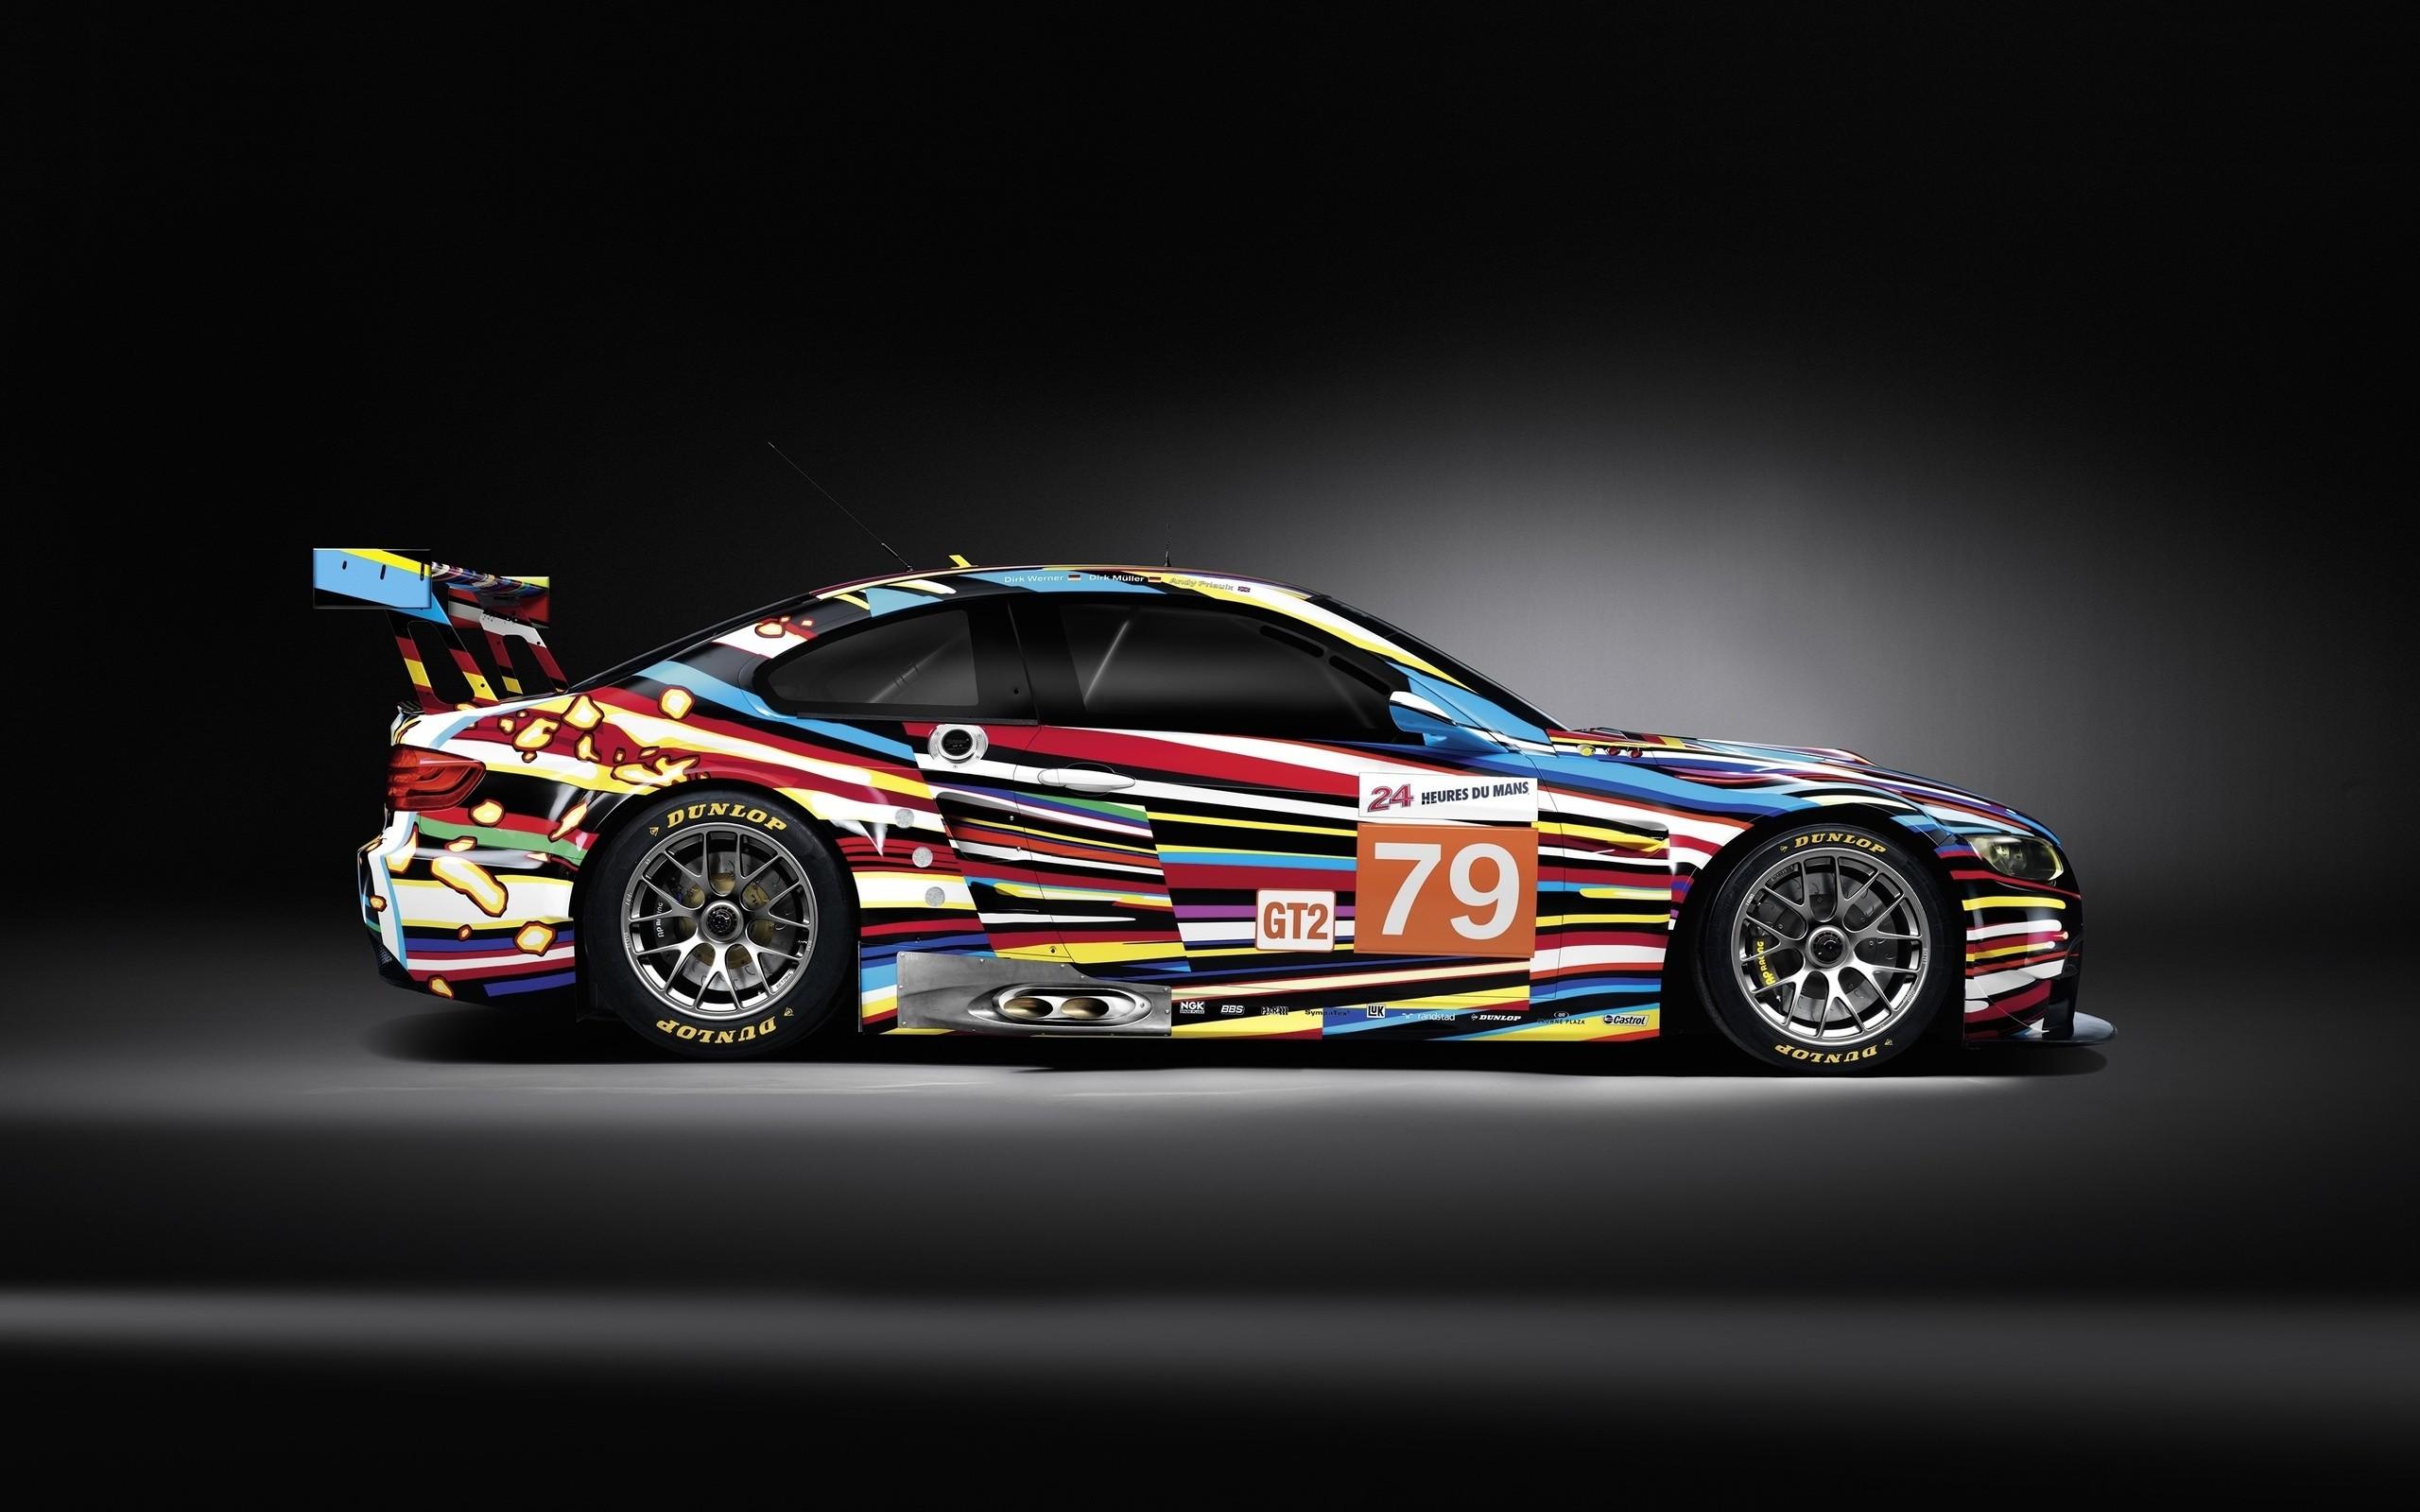 [49+] Cool Racing Cars Wallpapers on WallpaperSafari